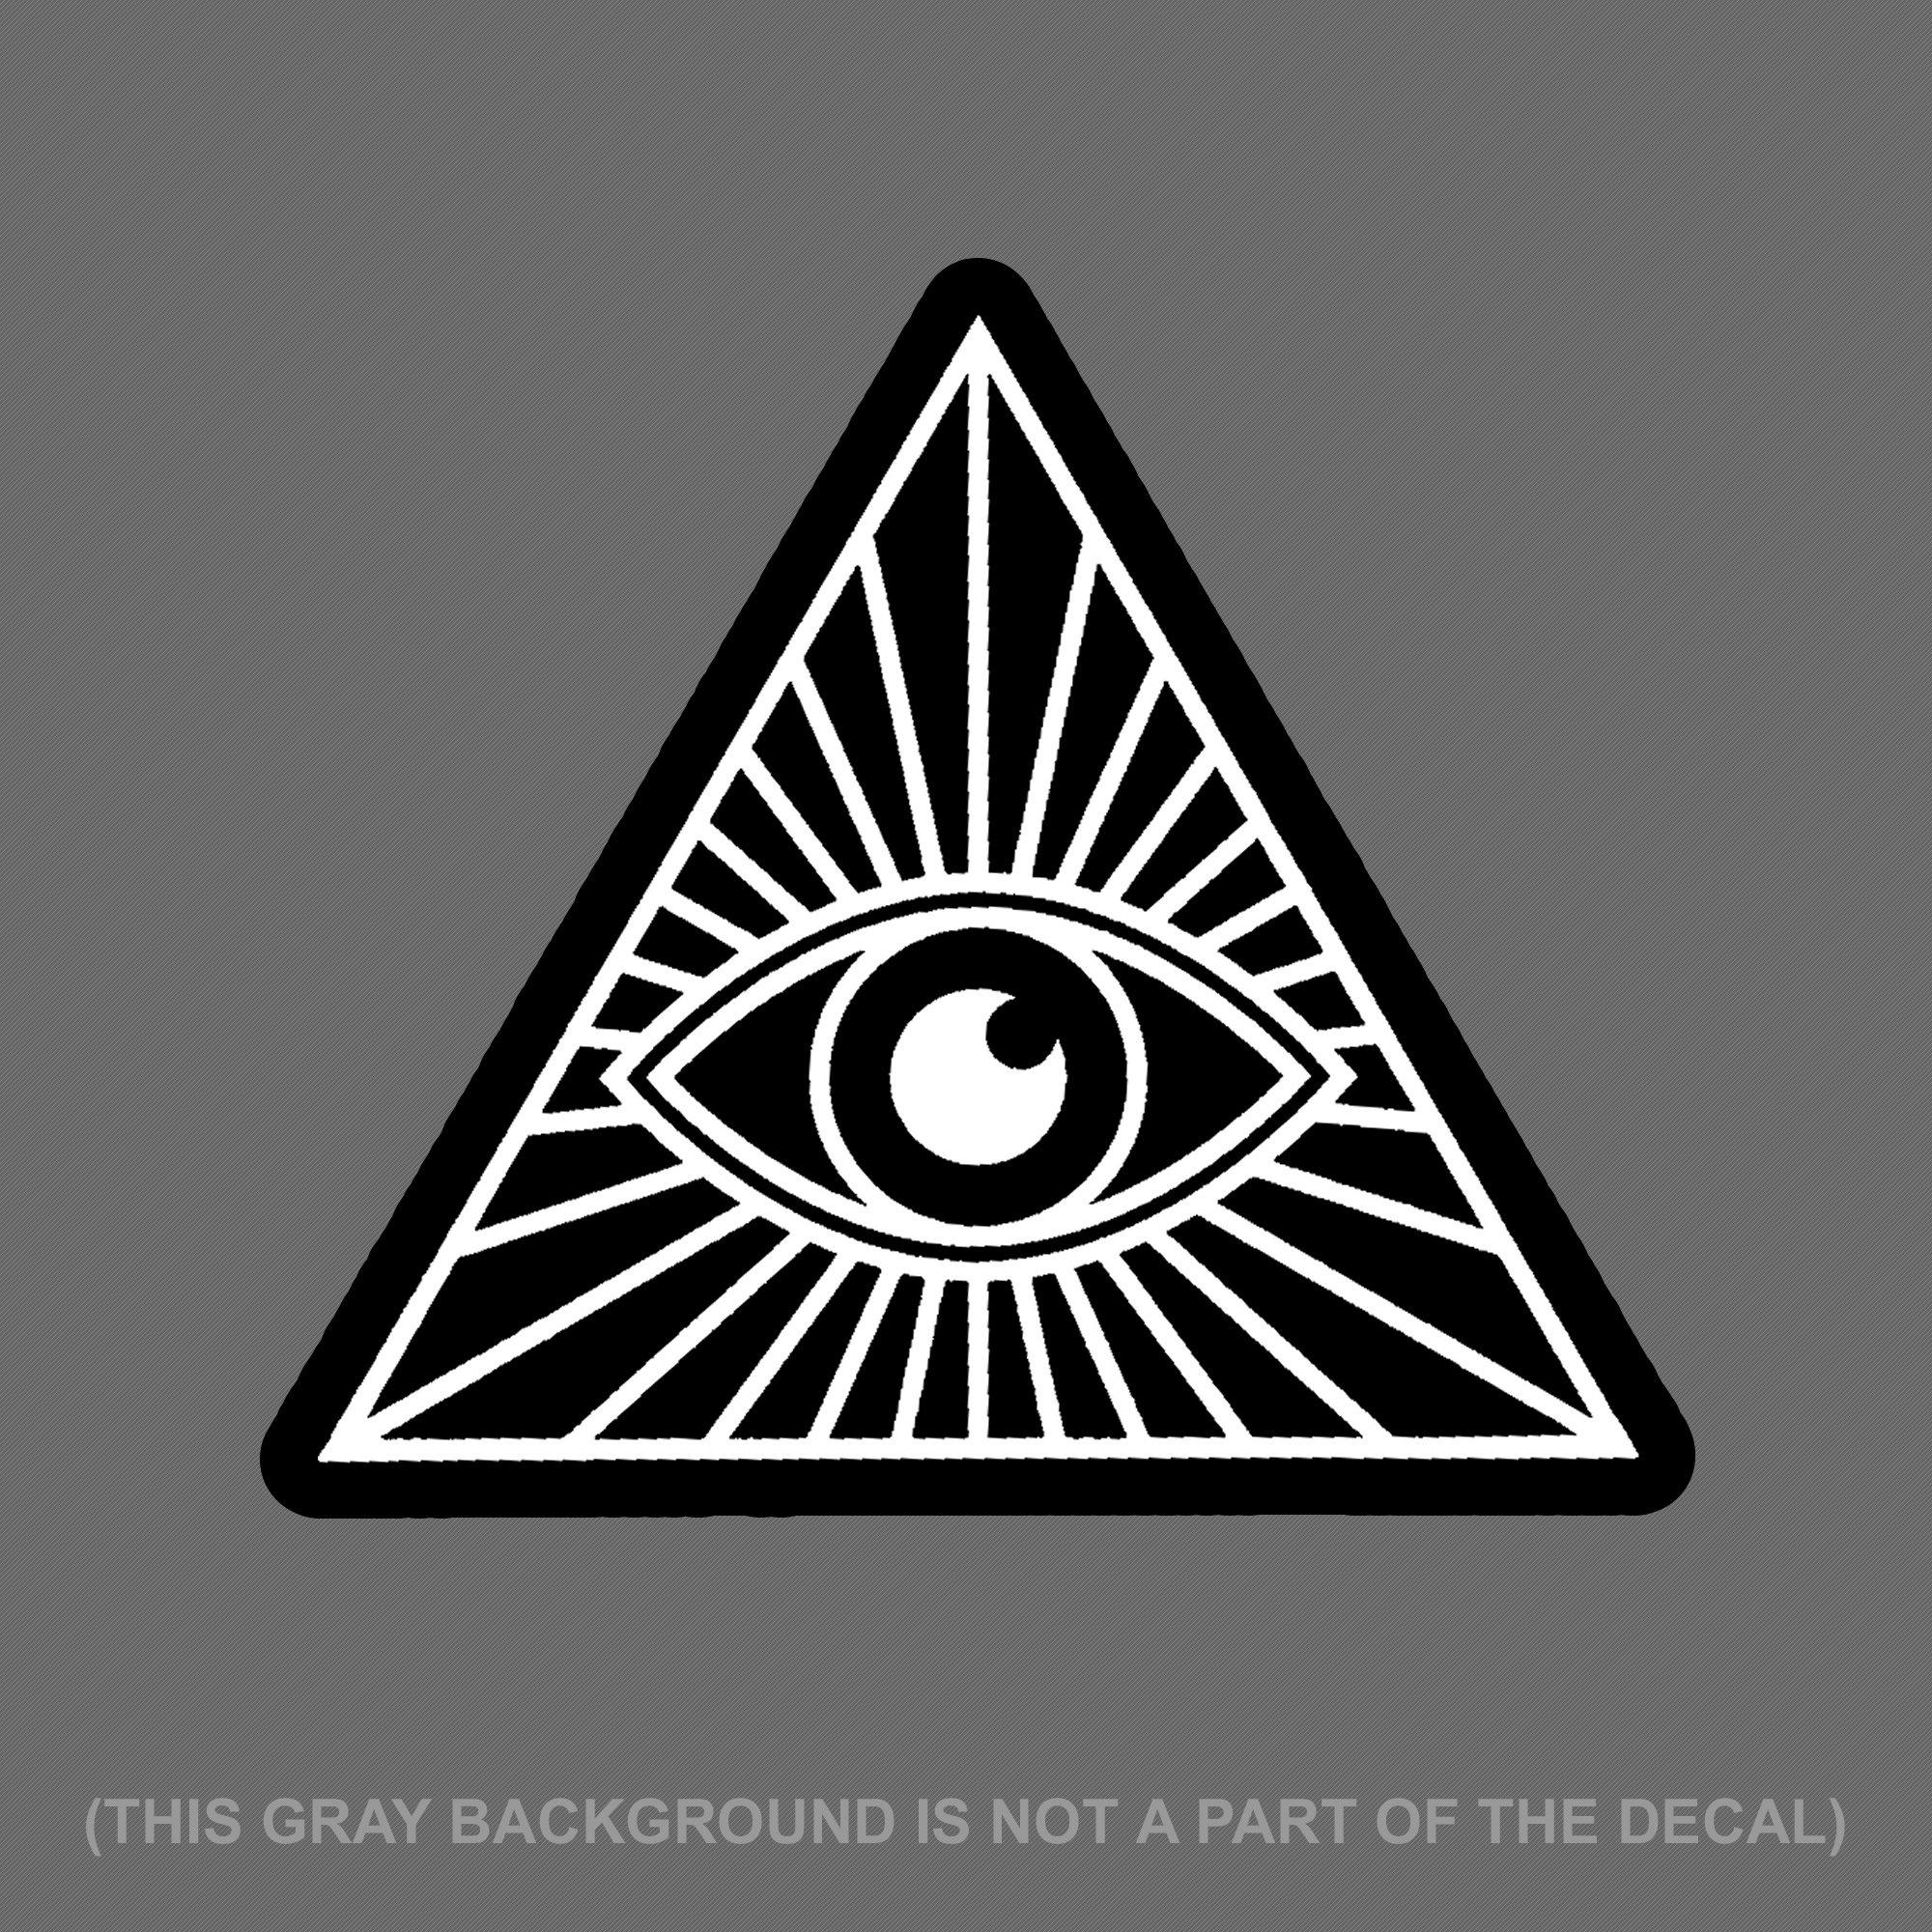 All Seeing Eye Illuminati Nwo Vinyl Decal Sticker 4 Digital Print Dxracer Racing Series Oh Rv001 Nv Black Violed